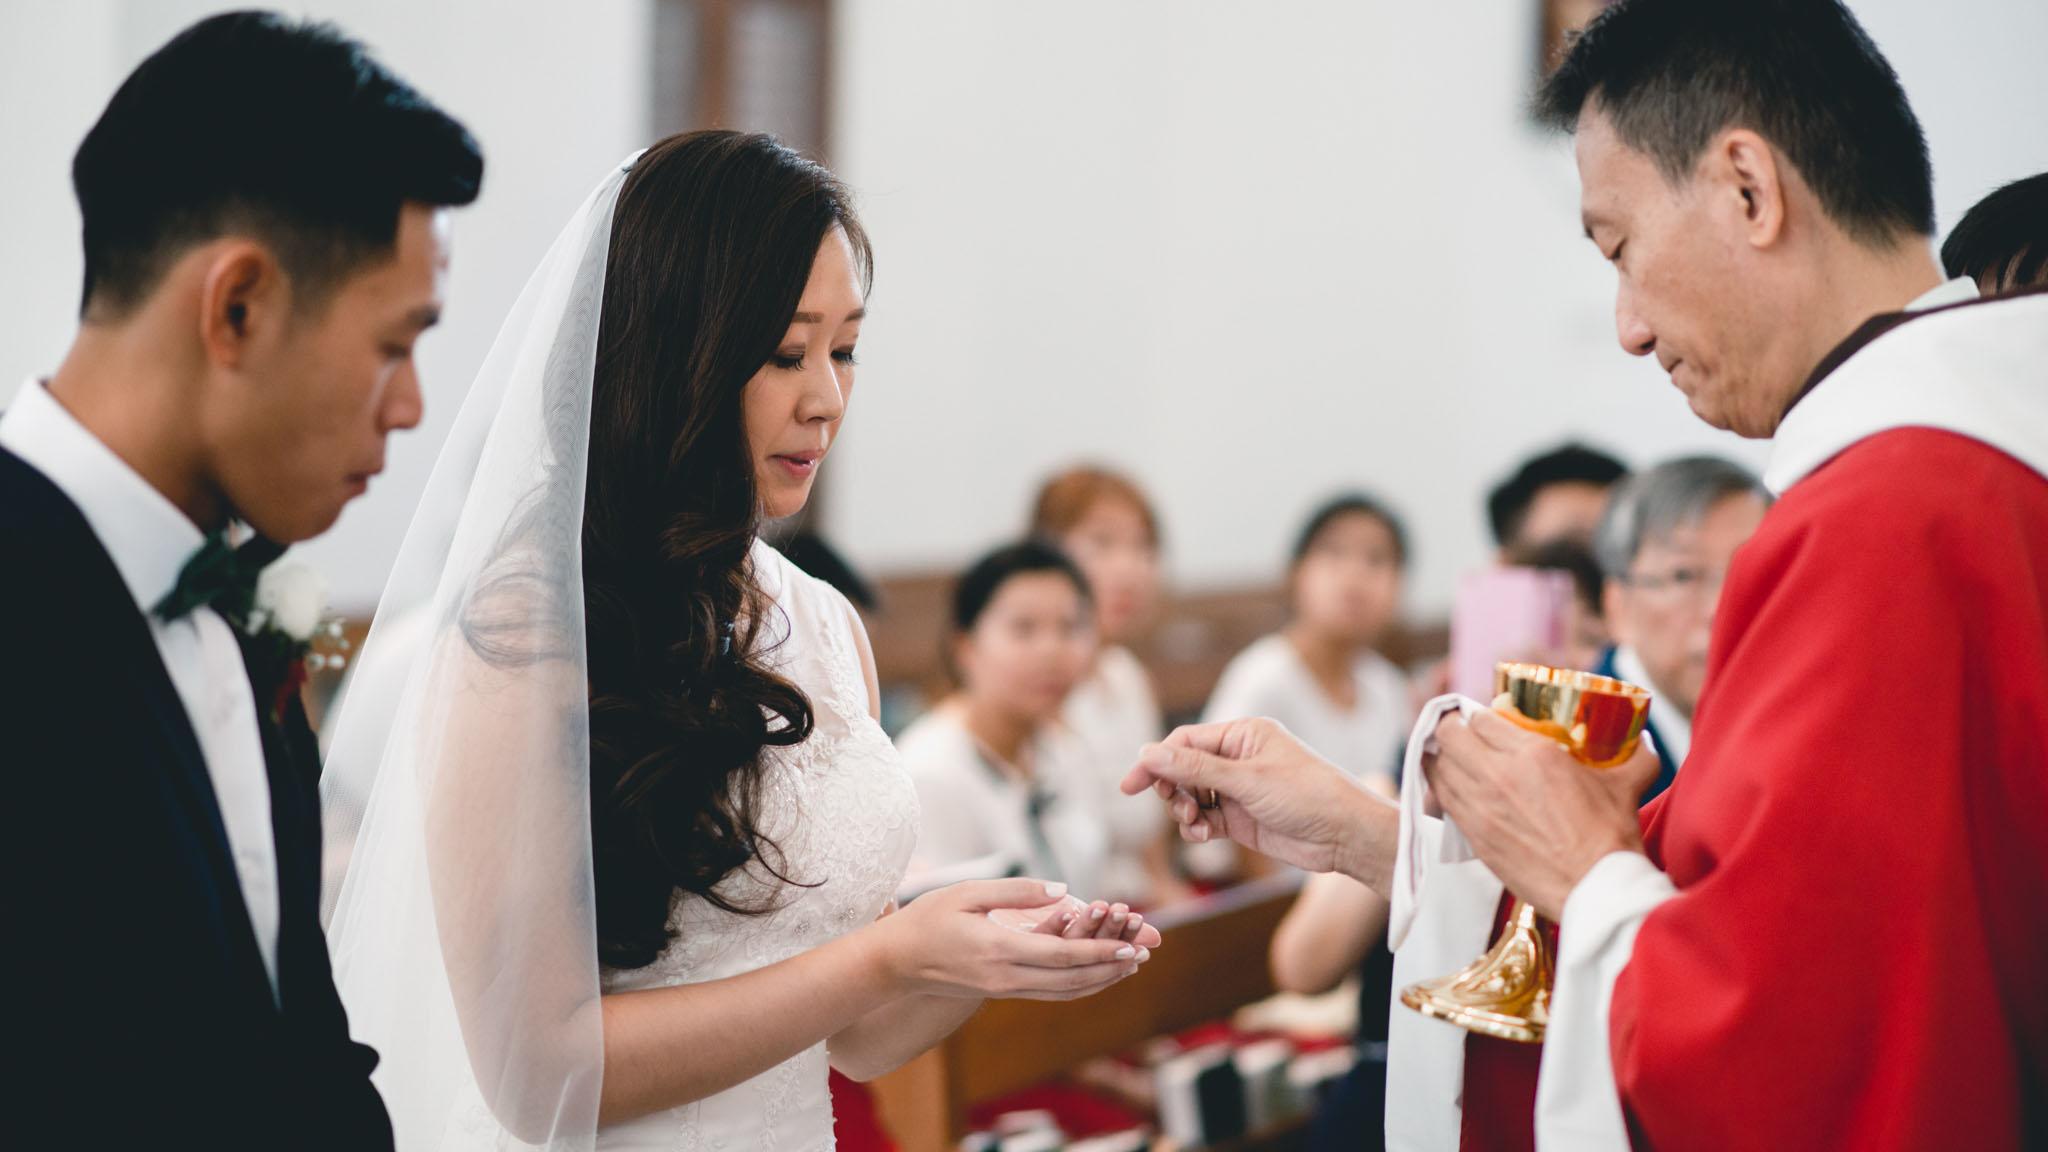 wedding church saints peter and paul 00044.JPG